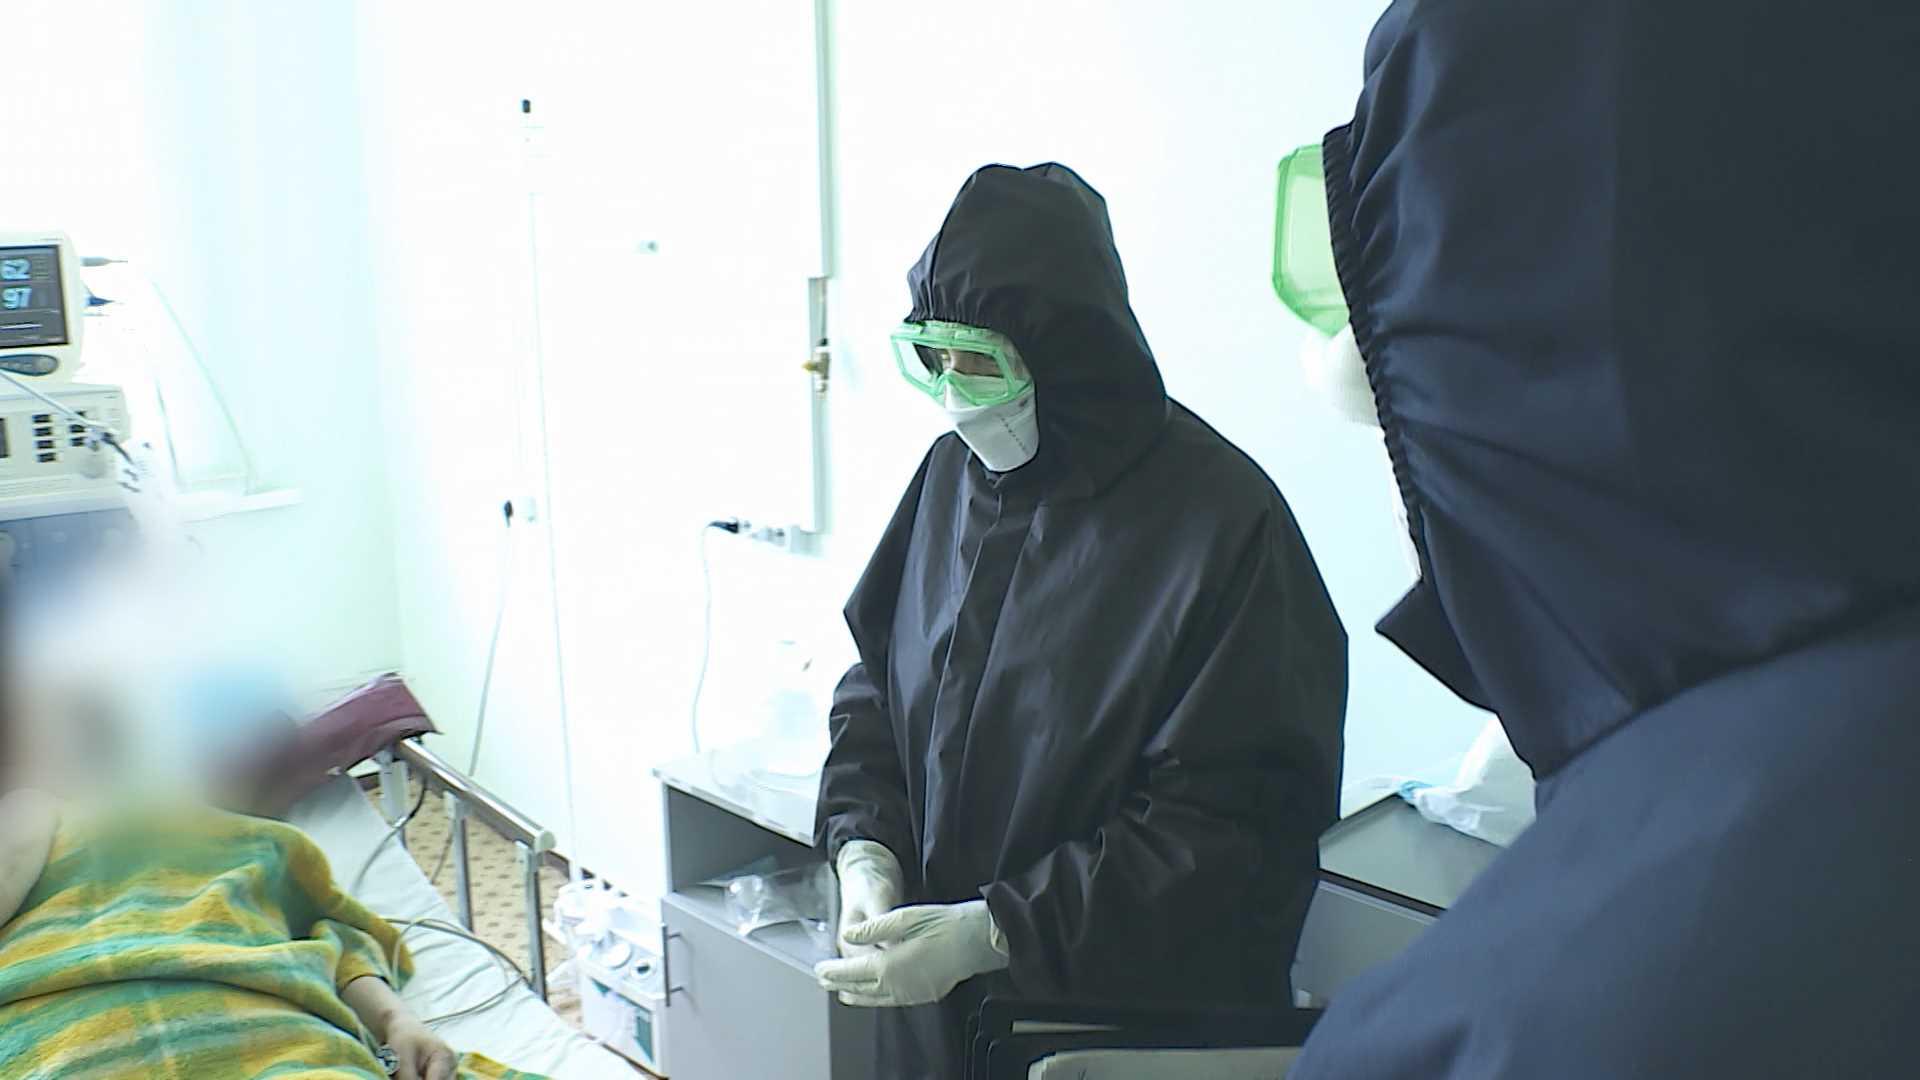 Три женщины и мужчина скончались в Костроме из-за коронавируса